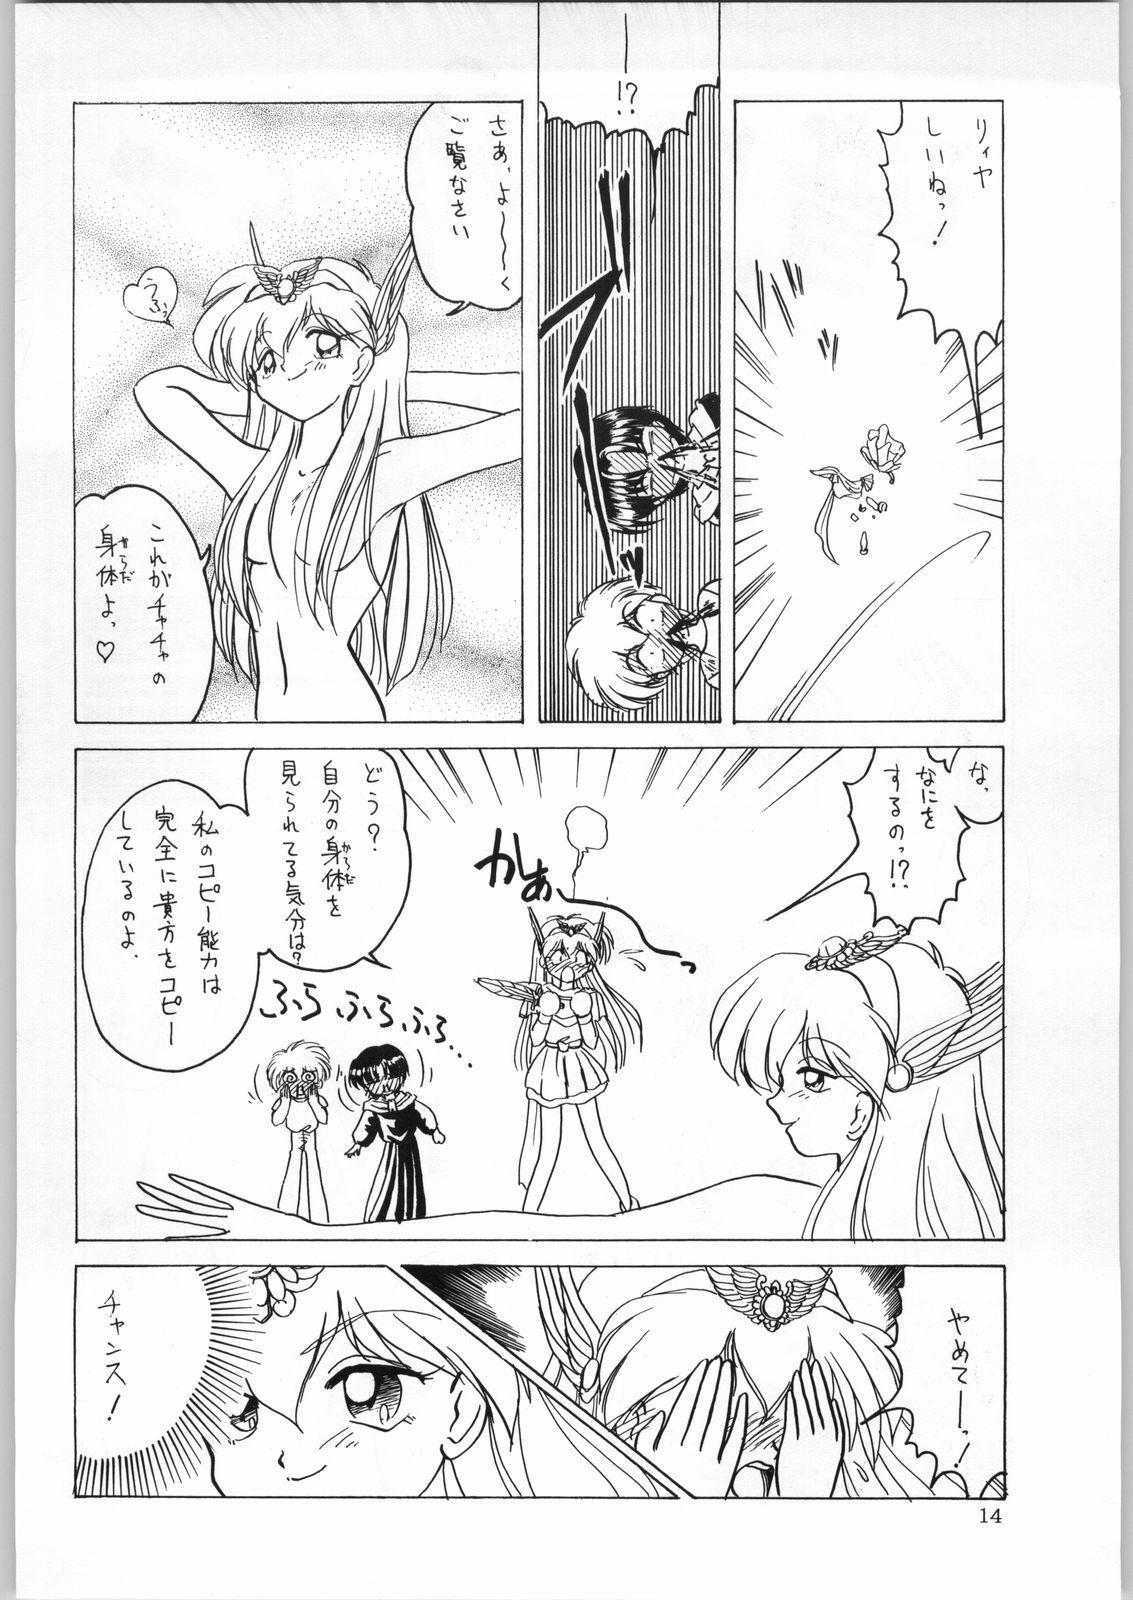 Dance of Princess 4 12